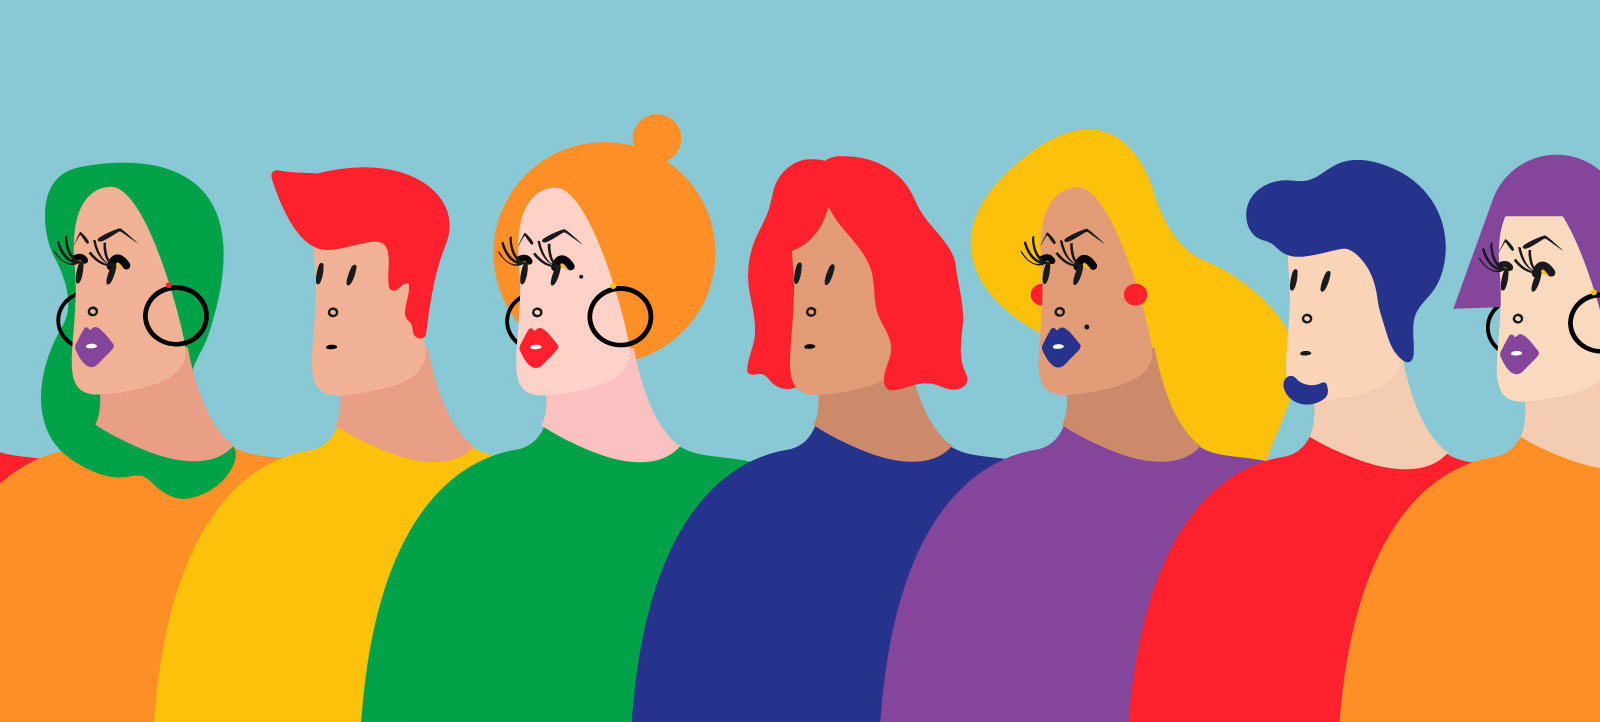 Colorful illustration of LGBTQ individuals